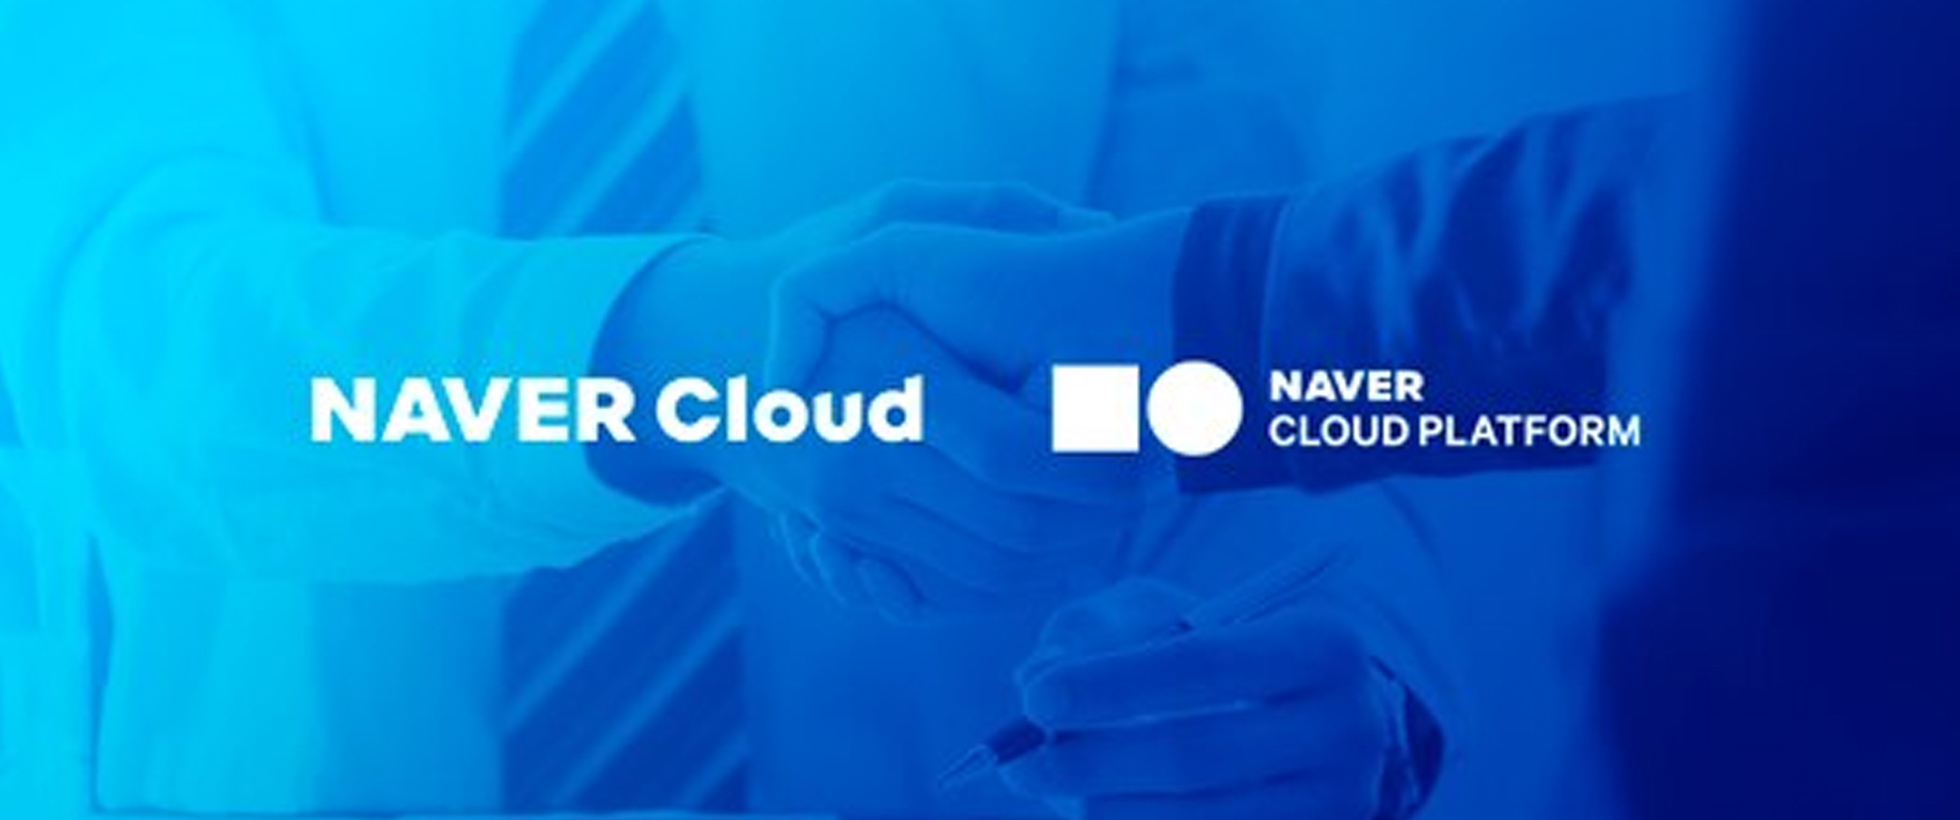 Naver Cloud 유럽 공식 파트너 CoolHan GmbH